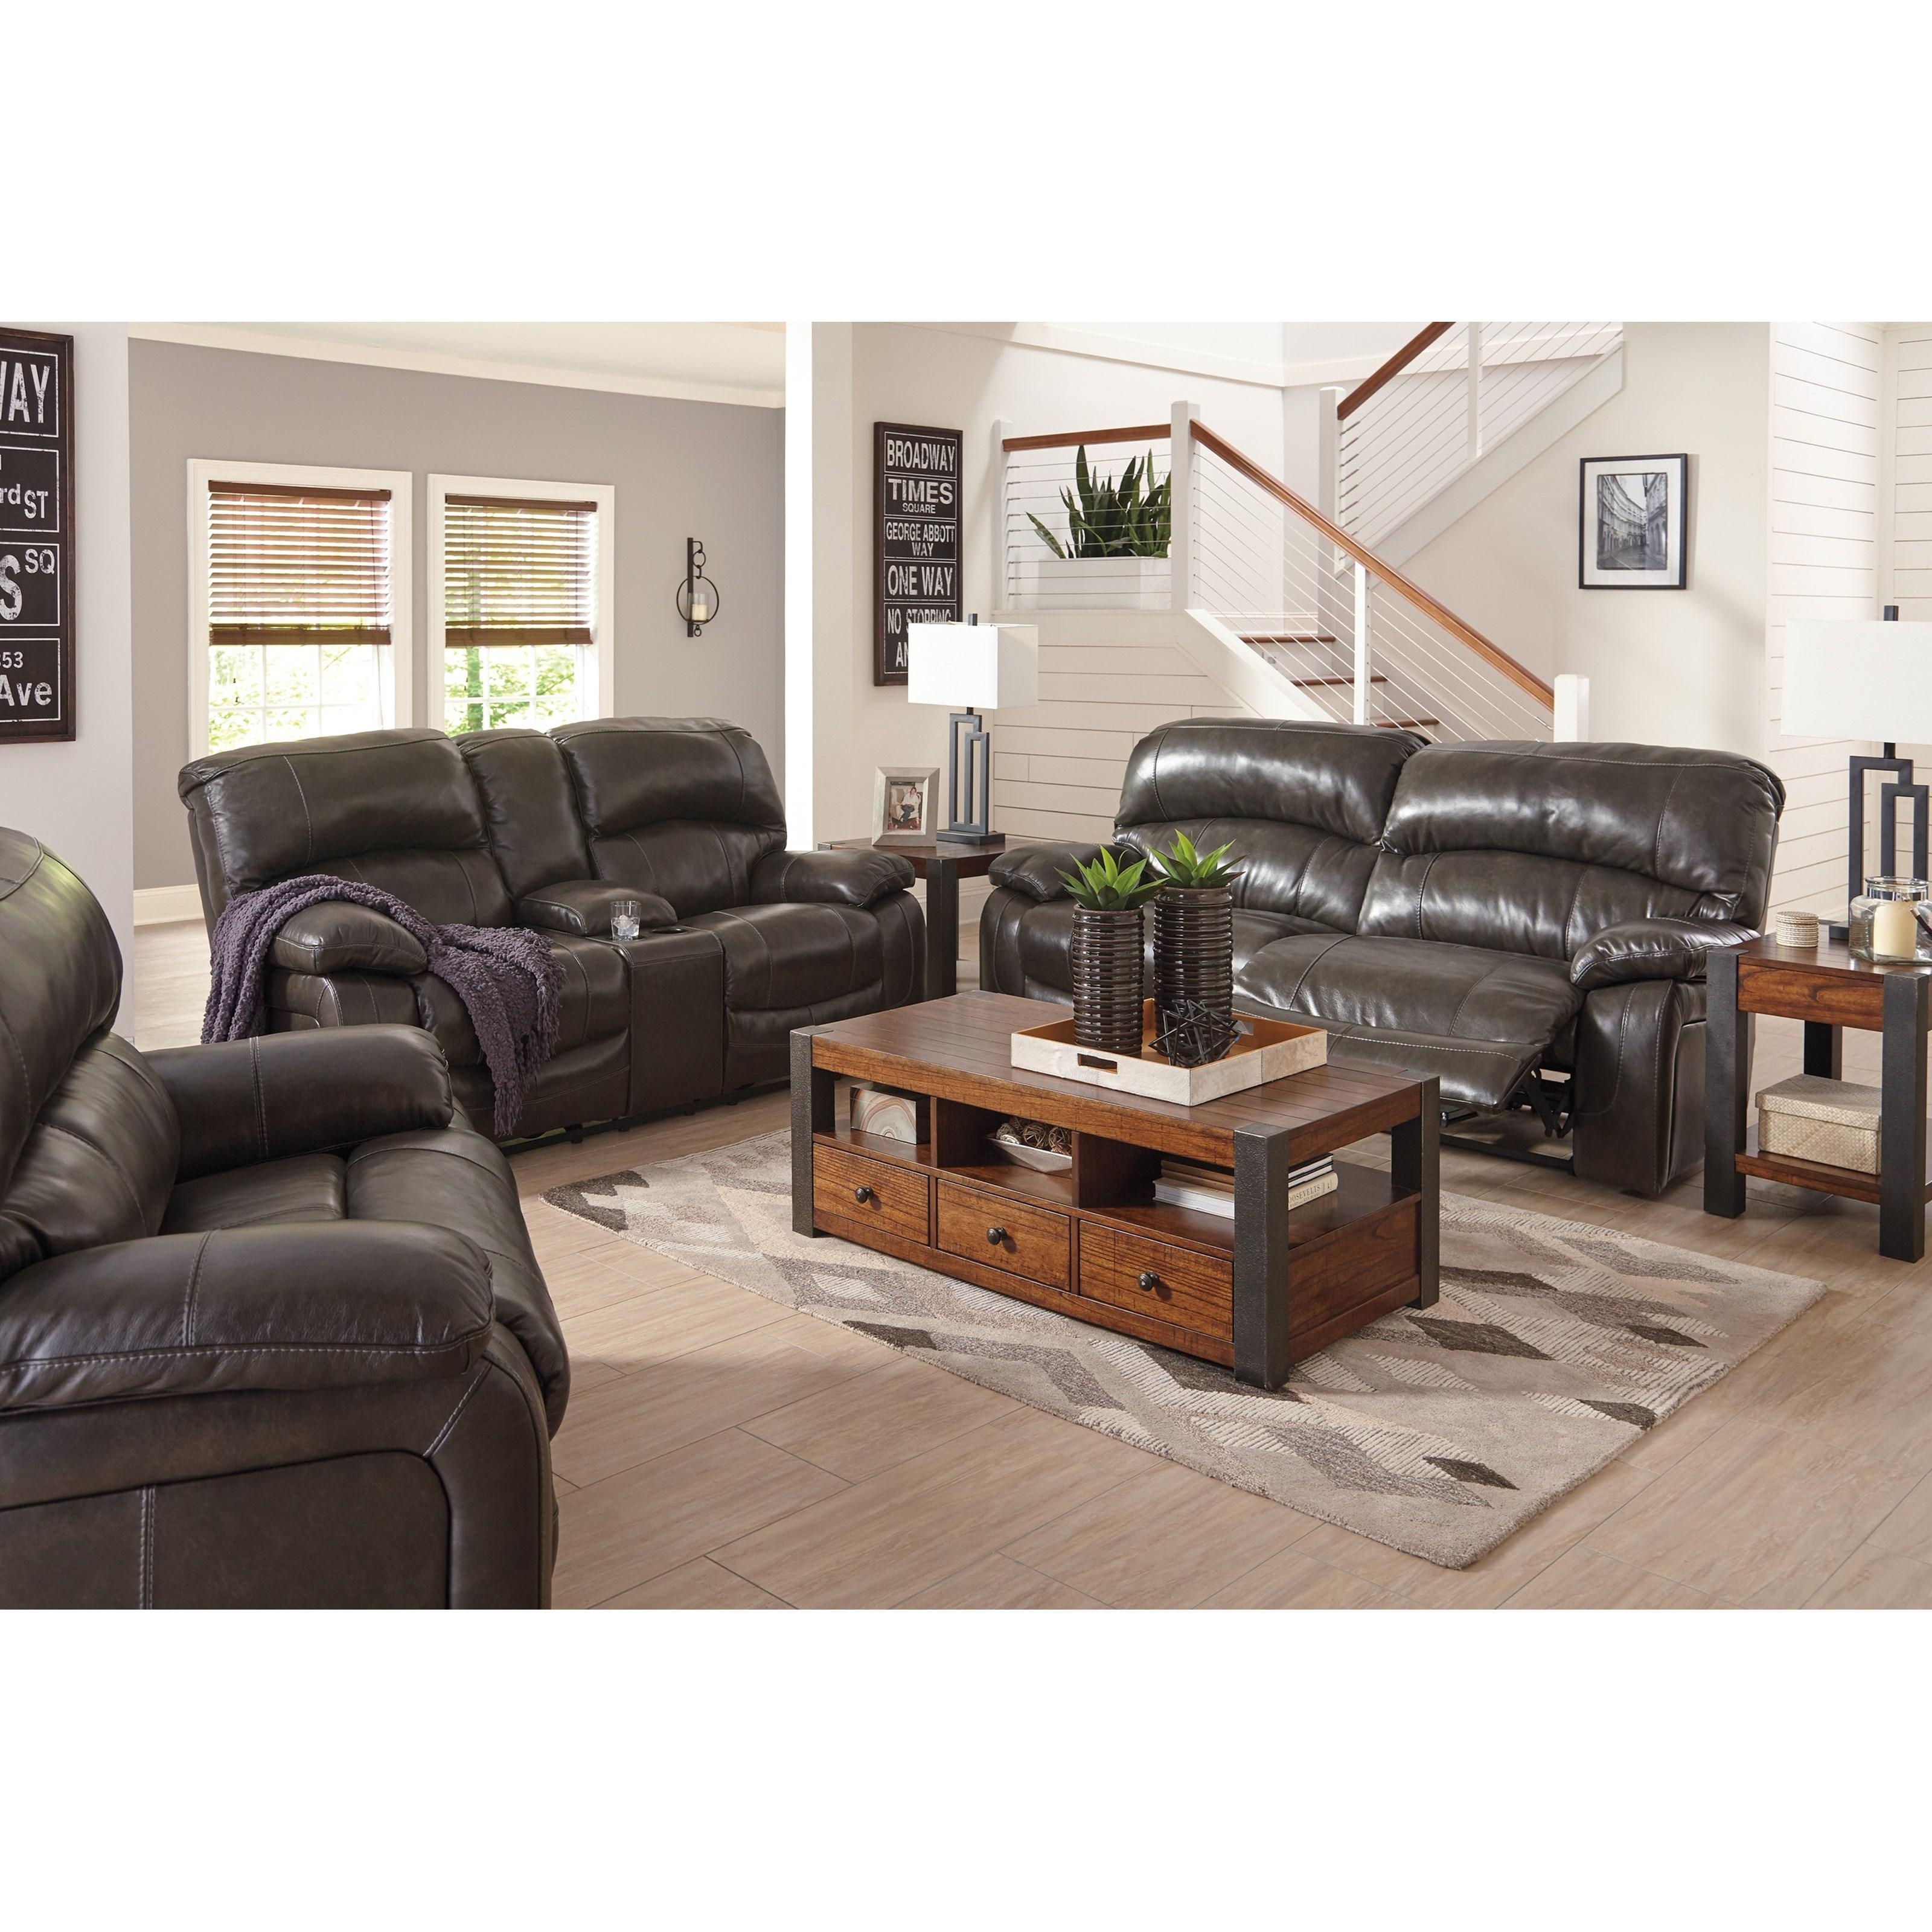 Marvelous Signature Design By Ashley Damacio   Metal Reclining Living Room Group Photo